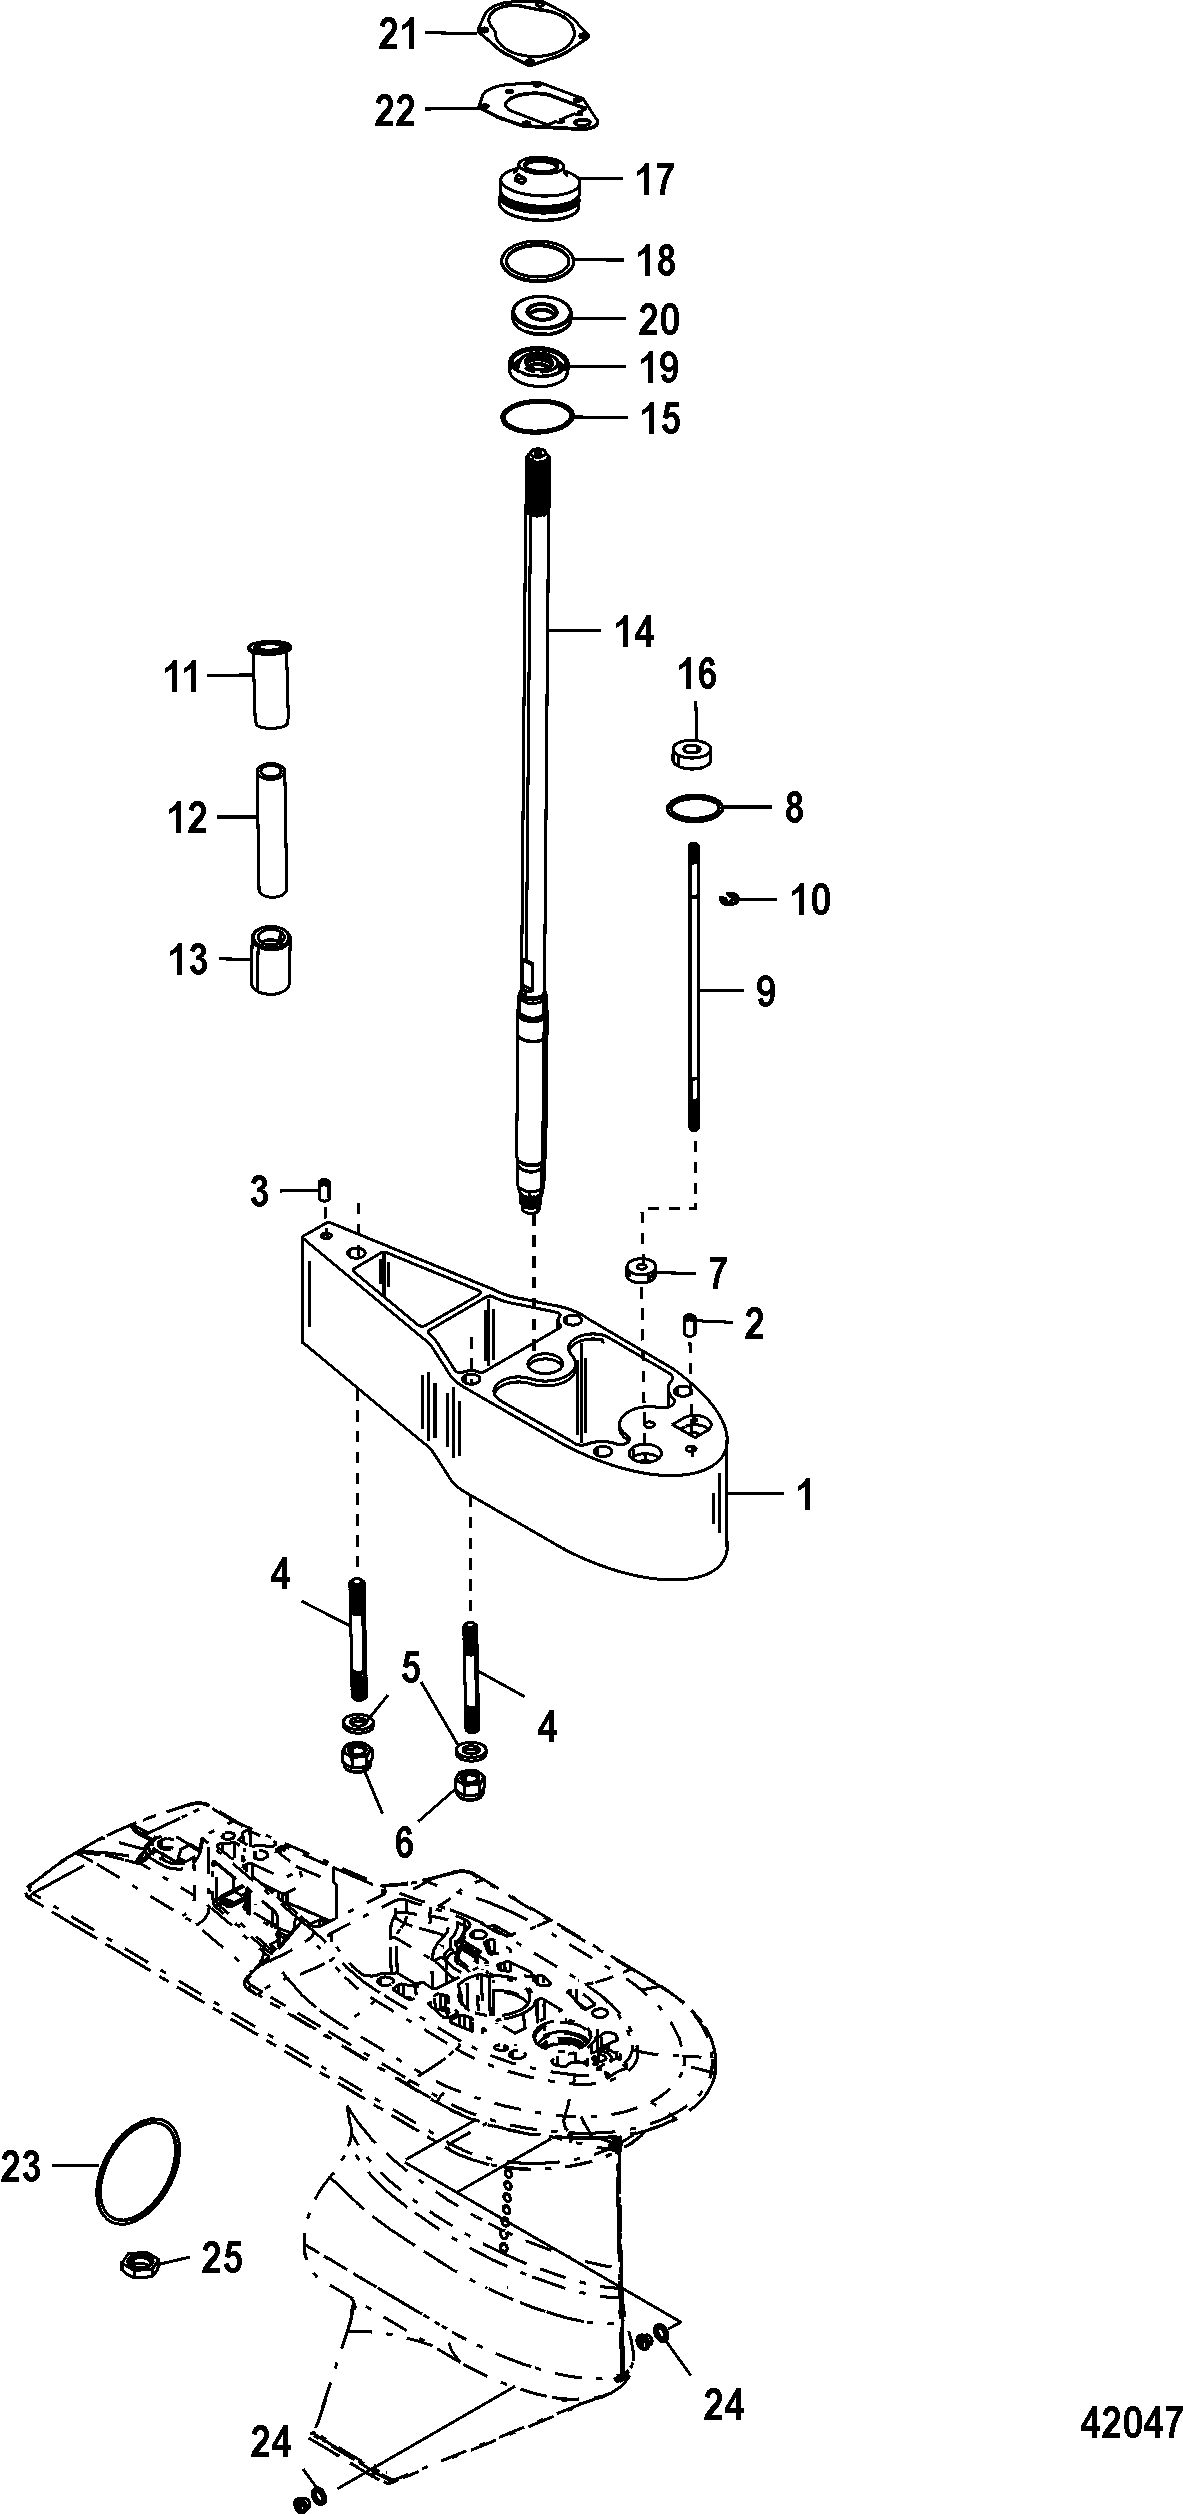 Каталог запчастей MARINER 40 EFI (4 CYL.)(4-STROKE